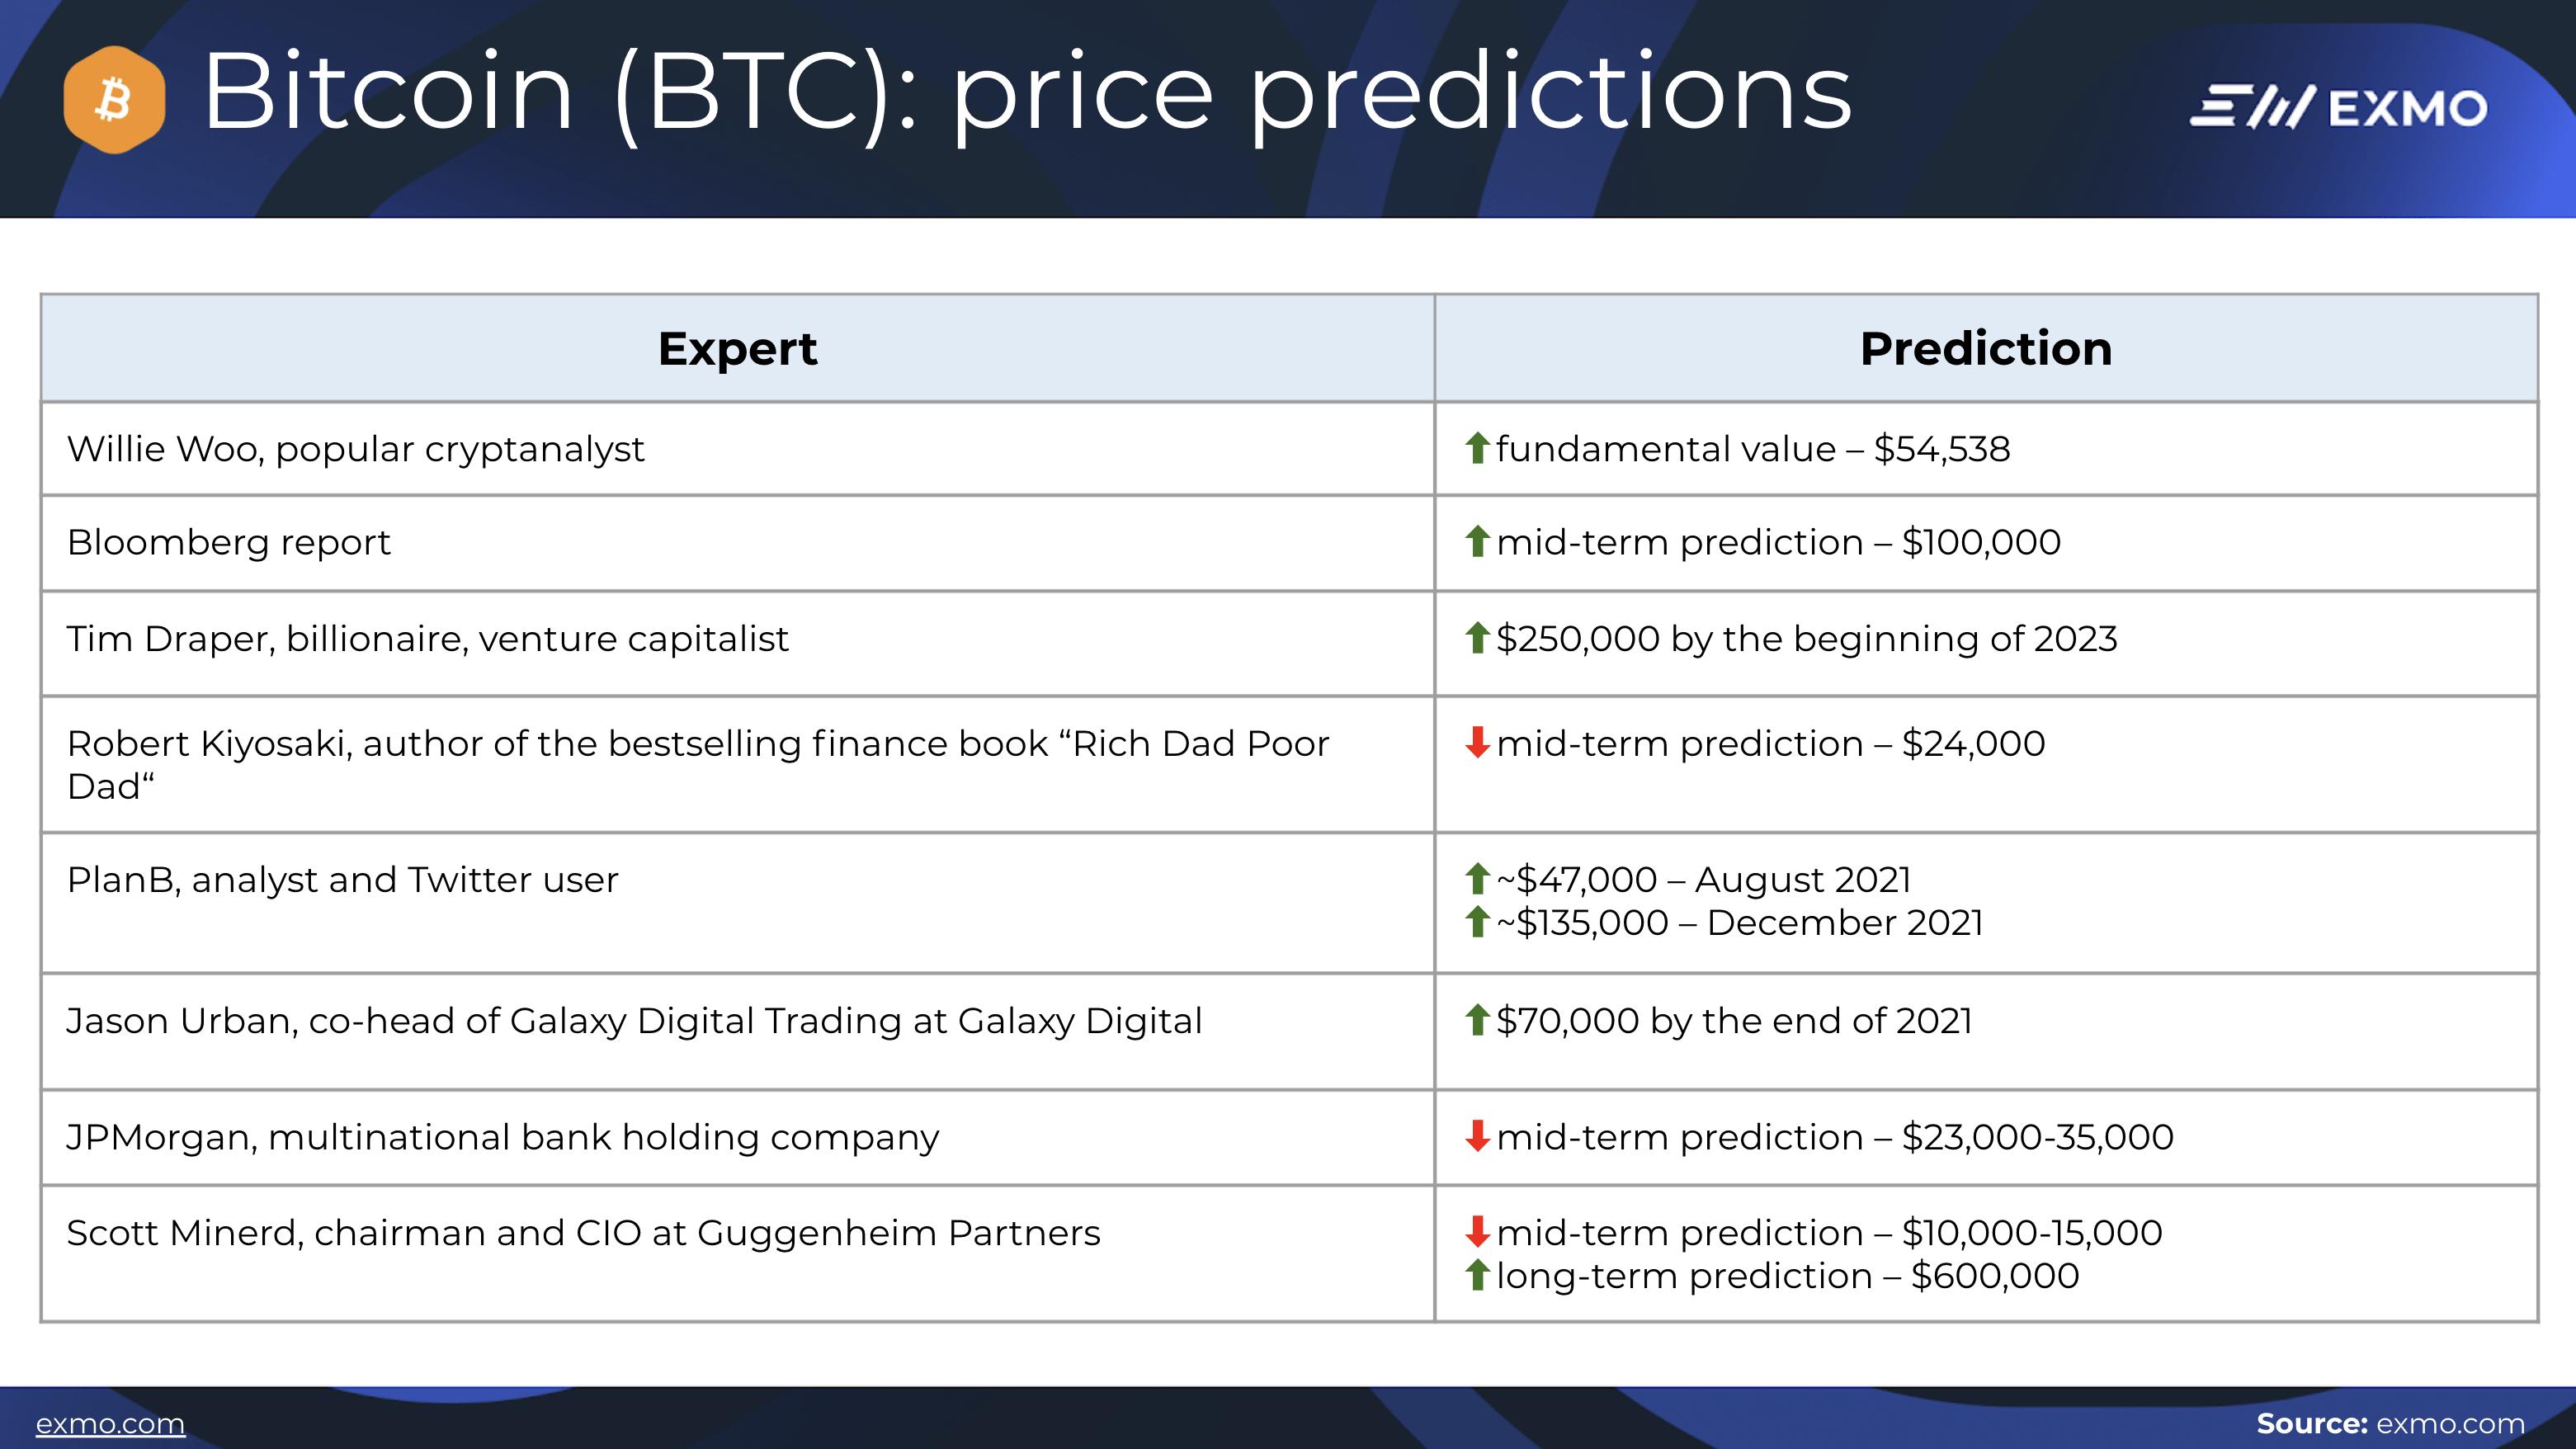 BTC predictions